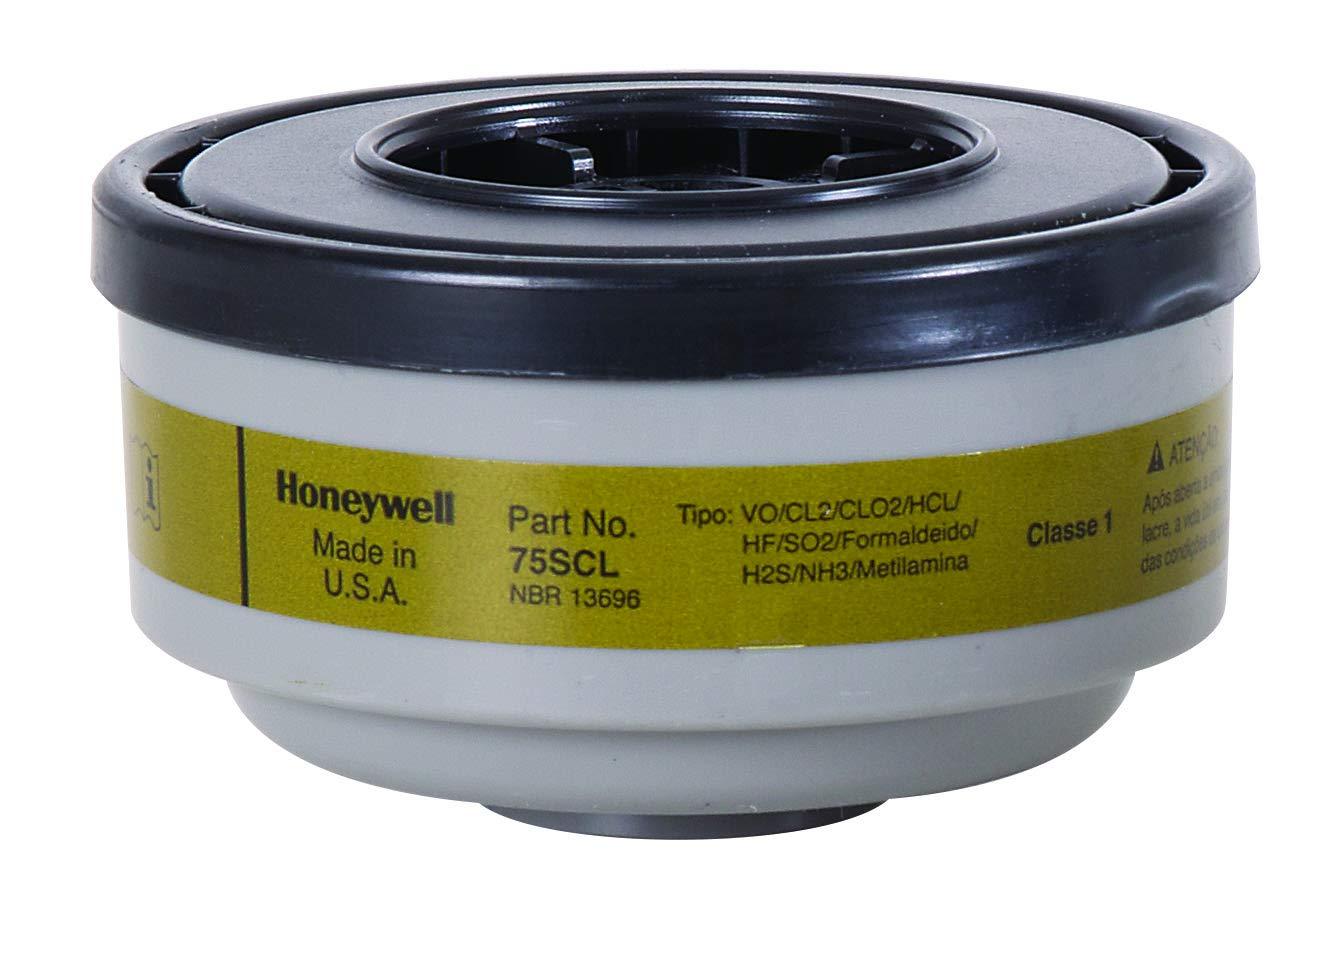 Honeywell 75SCL Multi-Contaminant Cartridge, Standard, Grey/Green (Pack of 36)